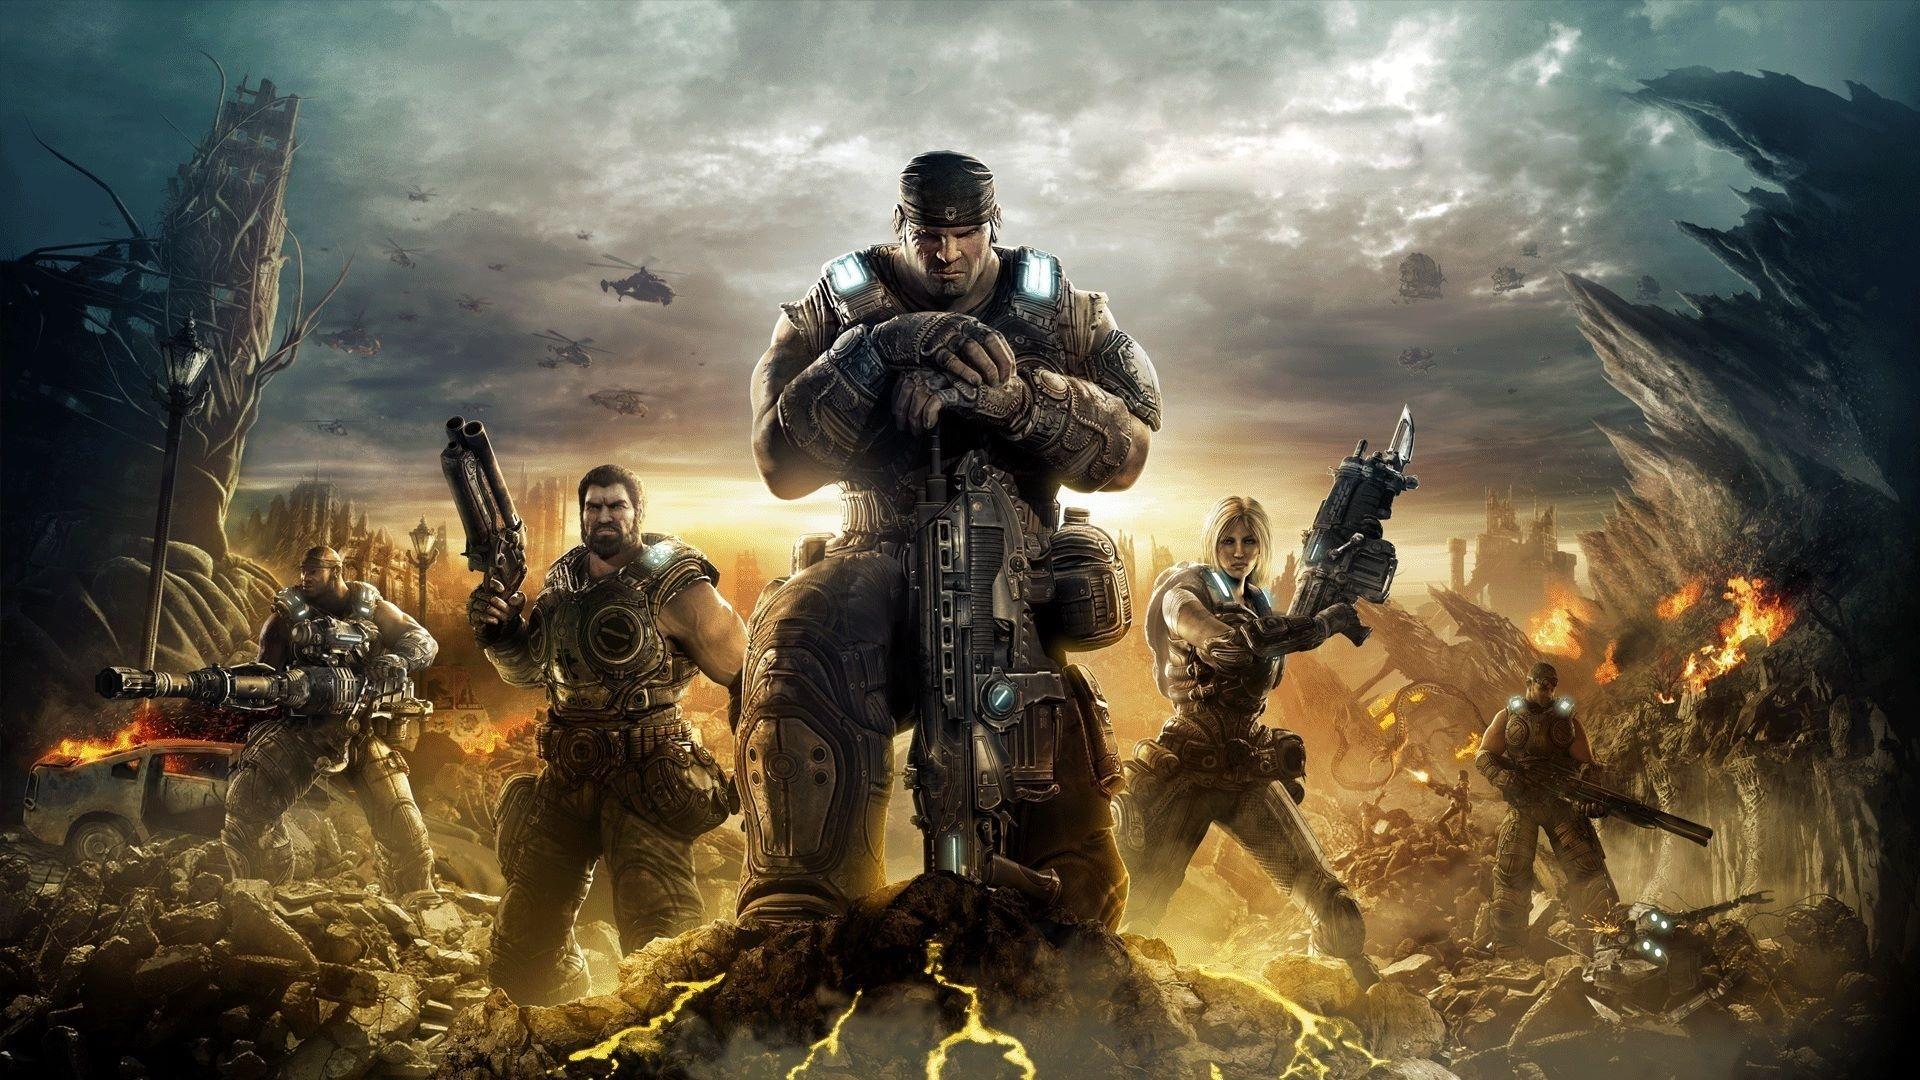 Gears Of War best wallpaper